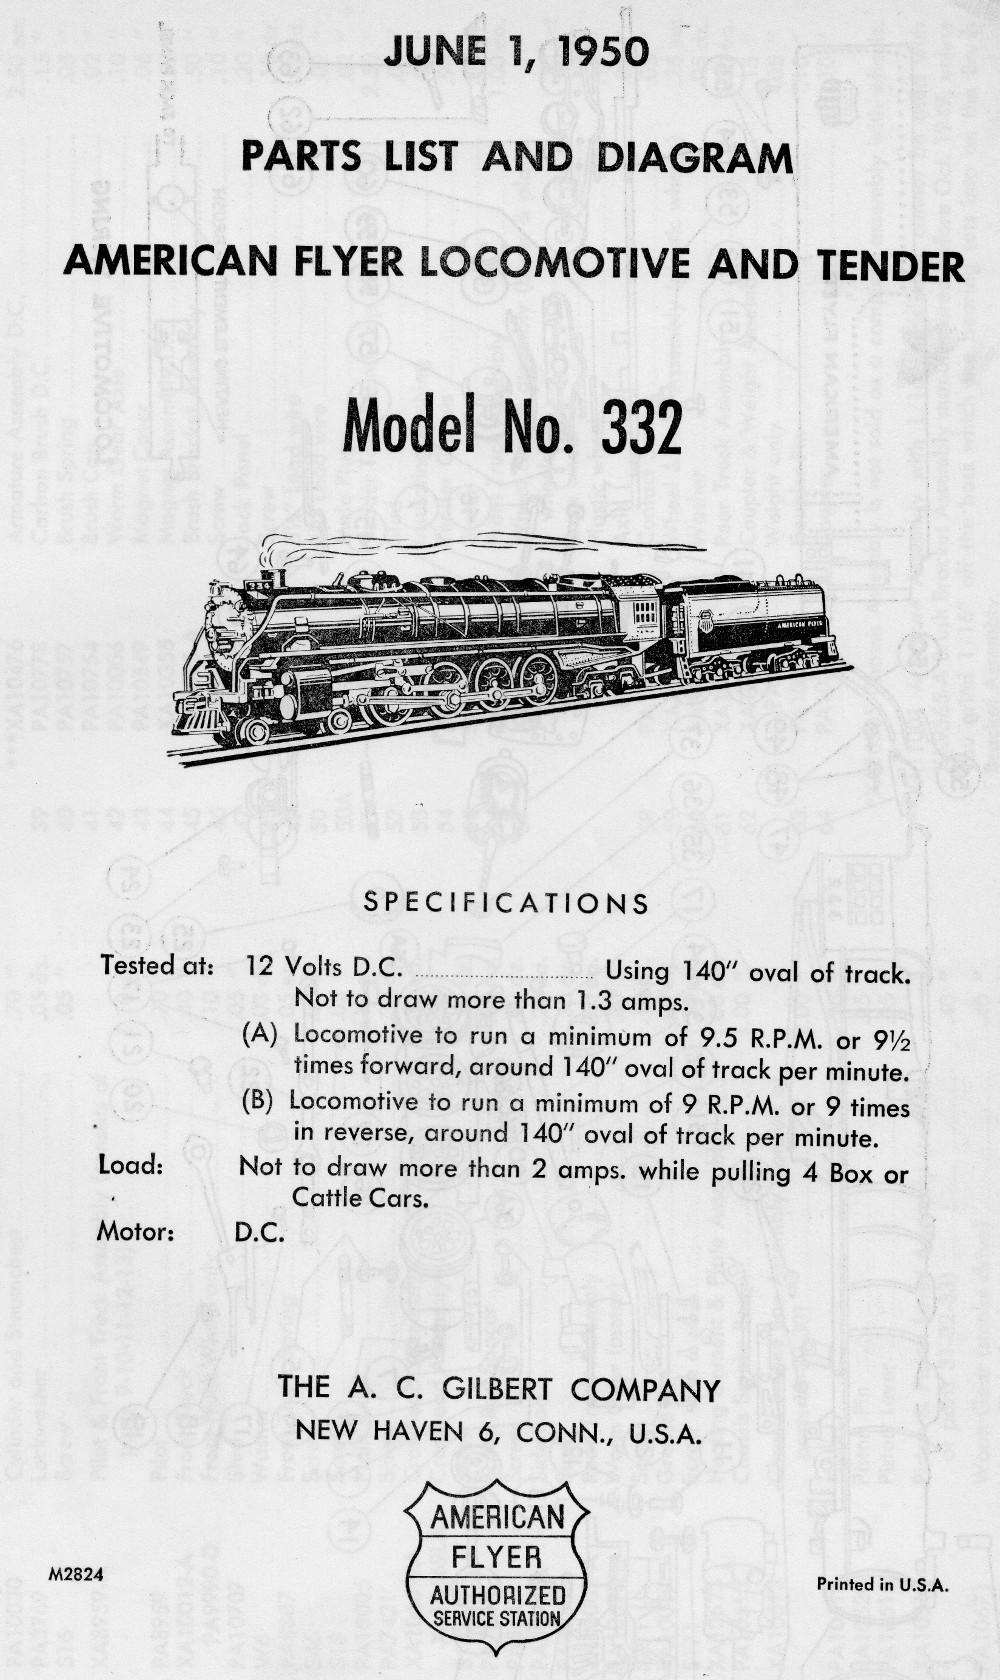 American Flyer Locomotive 332 Parts List and Diagram